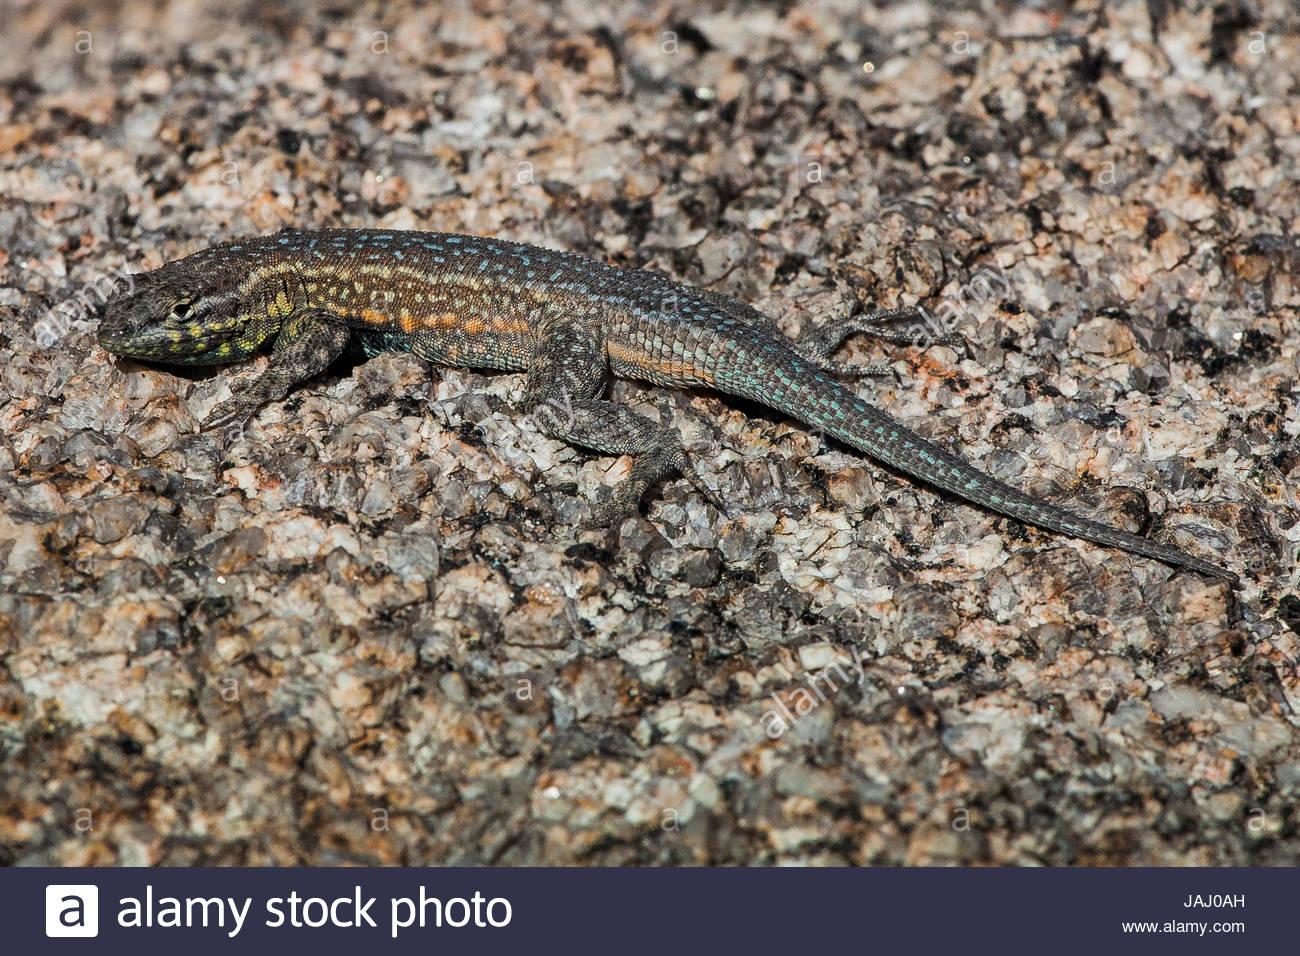 Portrait of a side-blotched lizard, Uta stansburiana, basking. - Stock Image